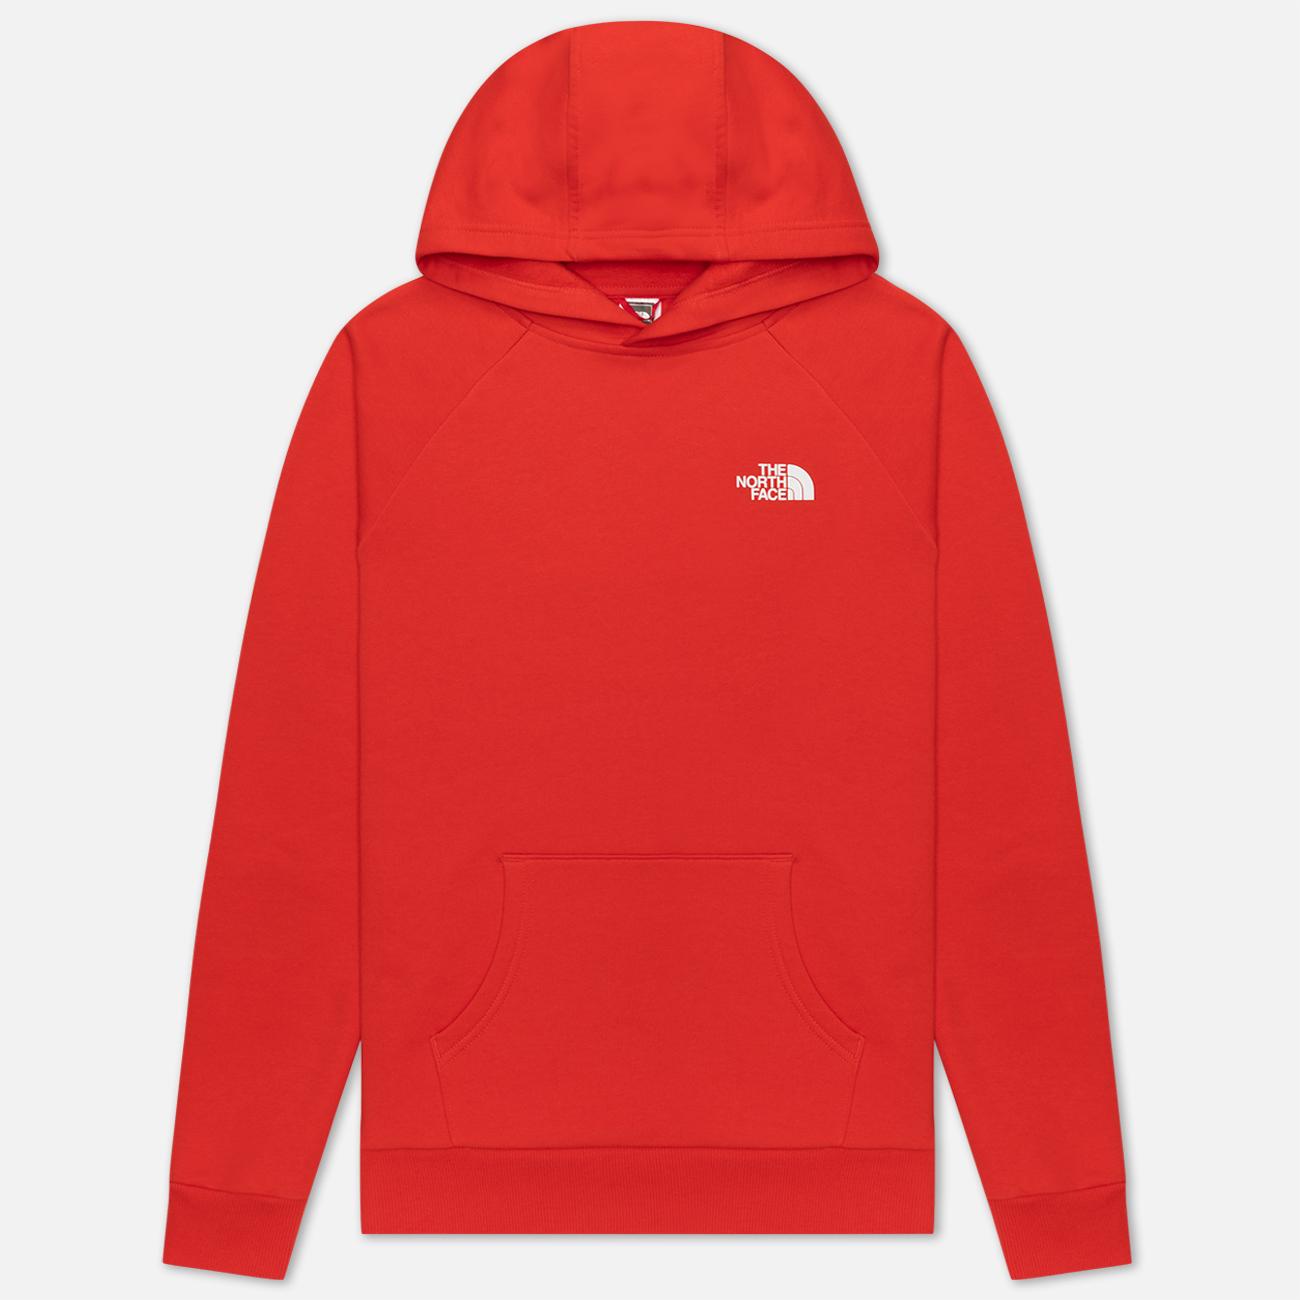 Мужская толстовка The North Face Raglan Red Box Hoodie Fiery Red